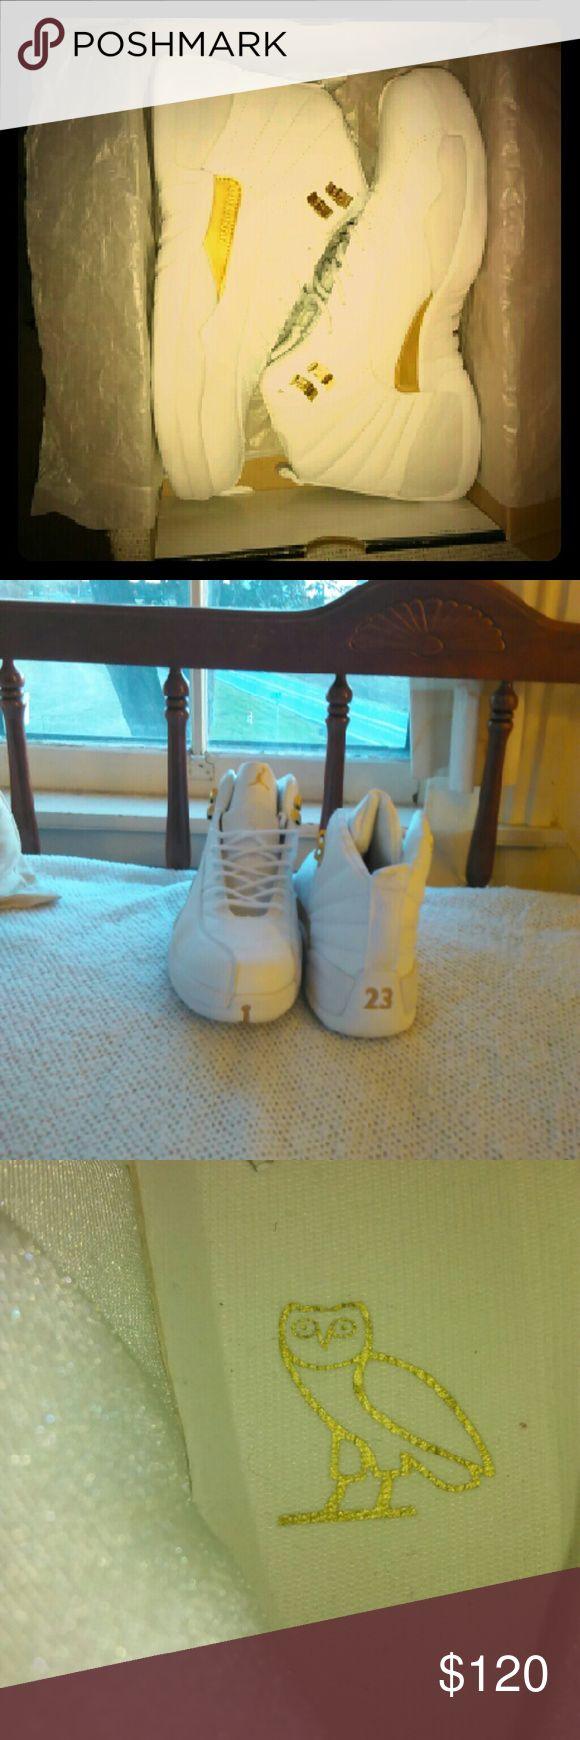 Jordan ovo 12 Size 10 Never worn  Replica Jordan Shoes Athletic Shoes